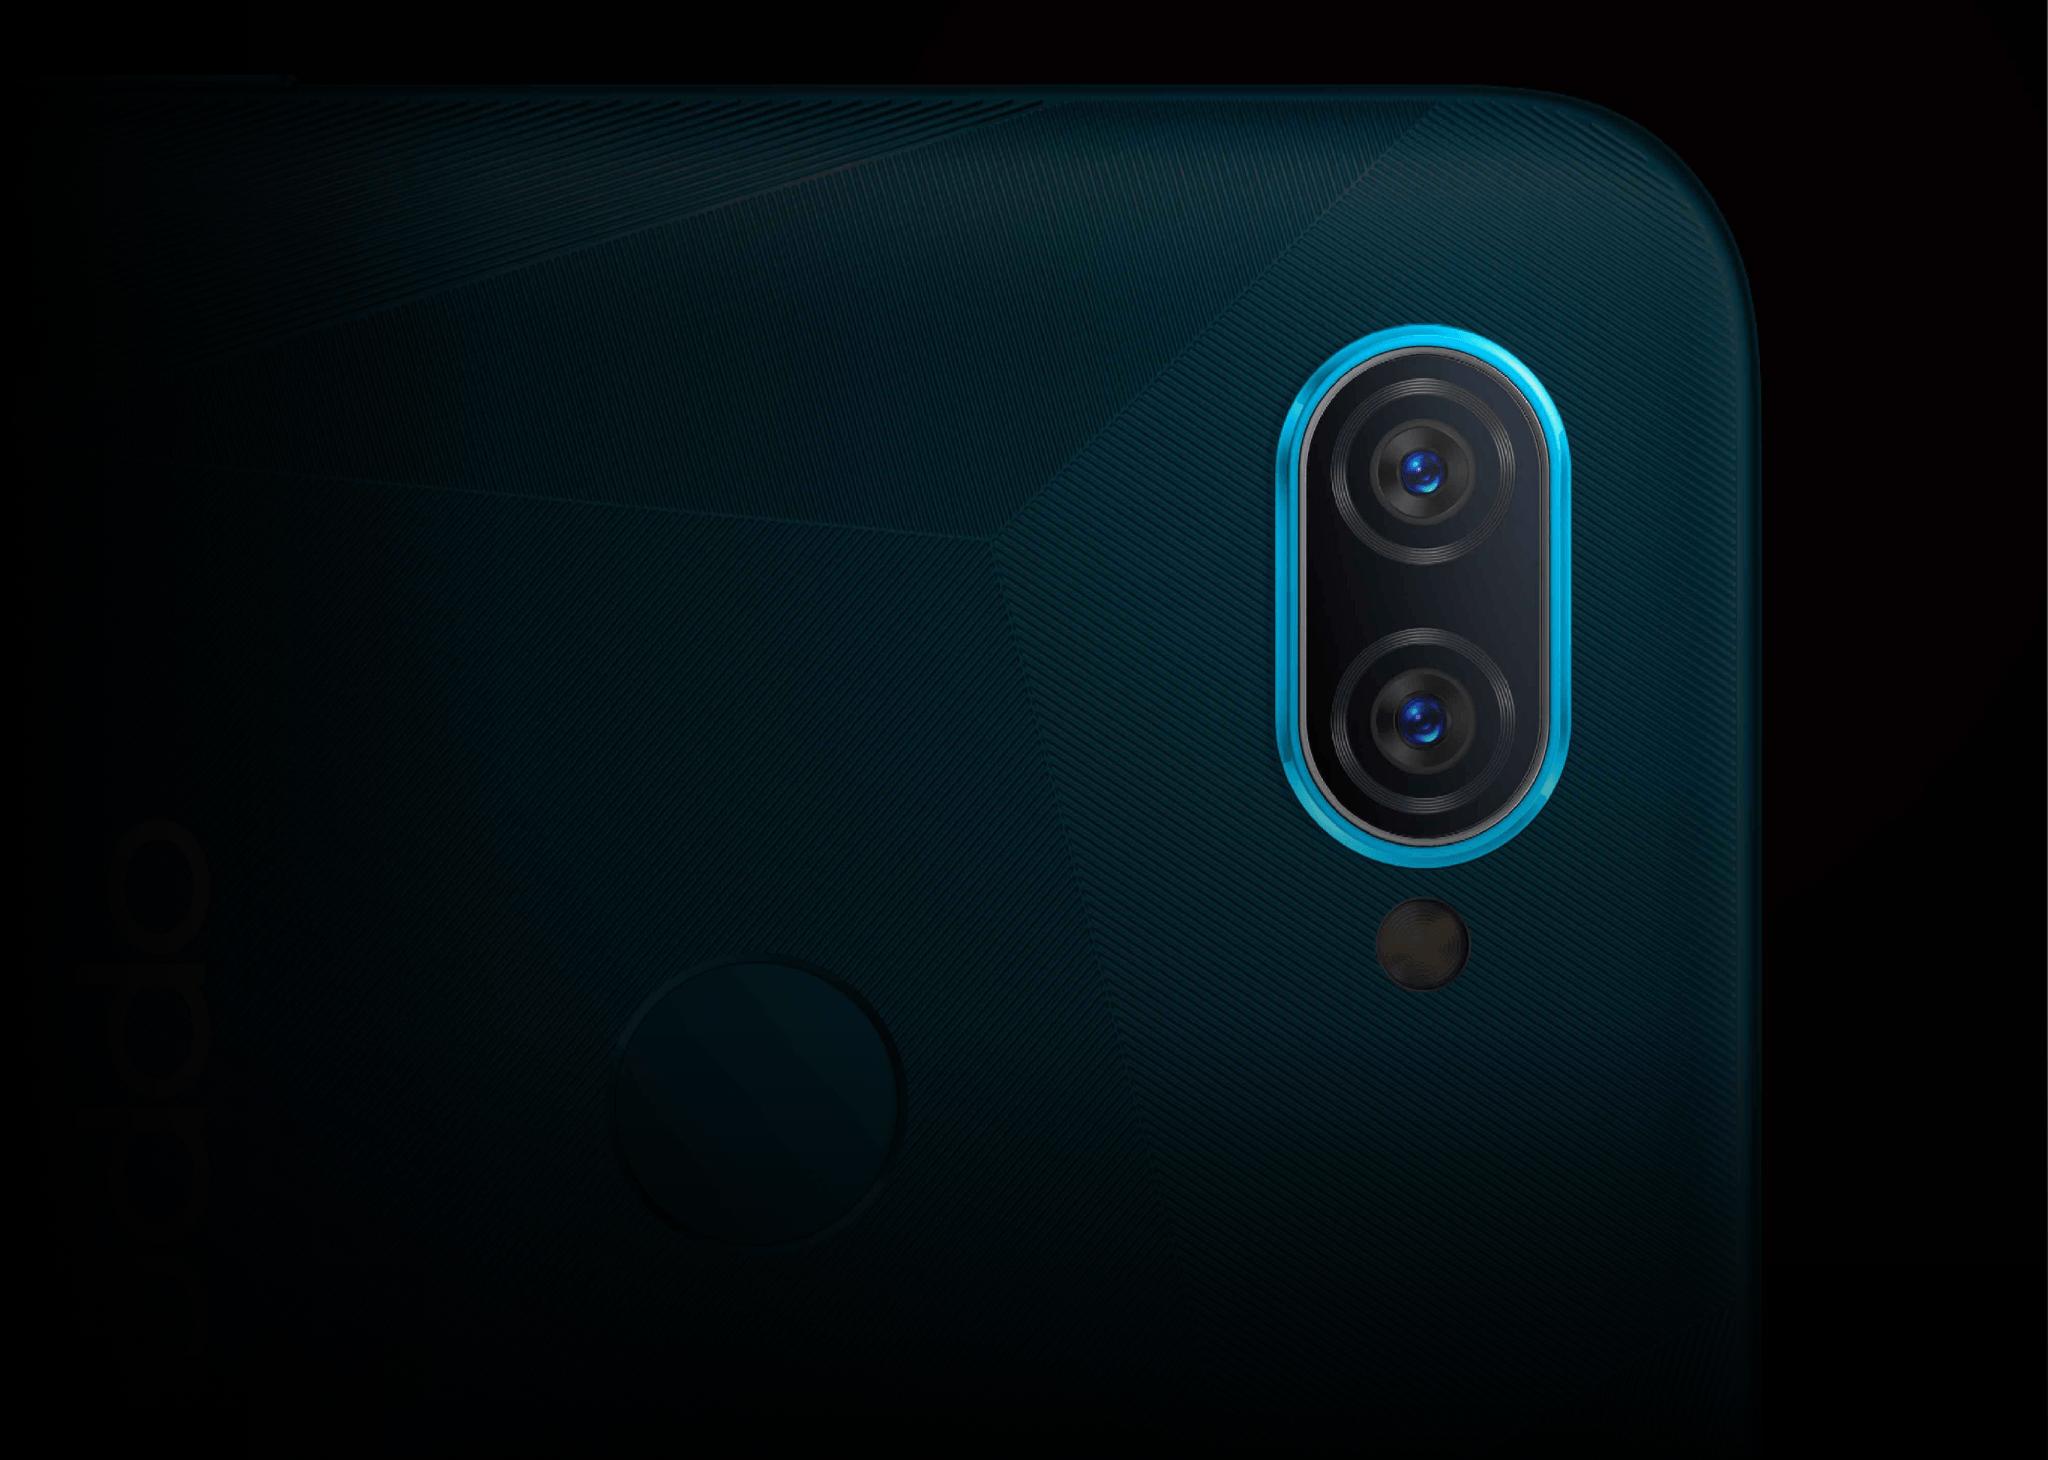 Camera of A12